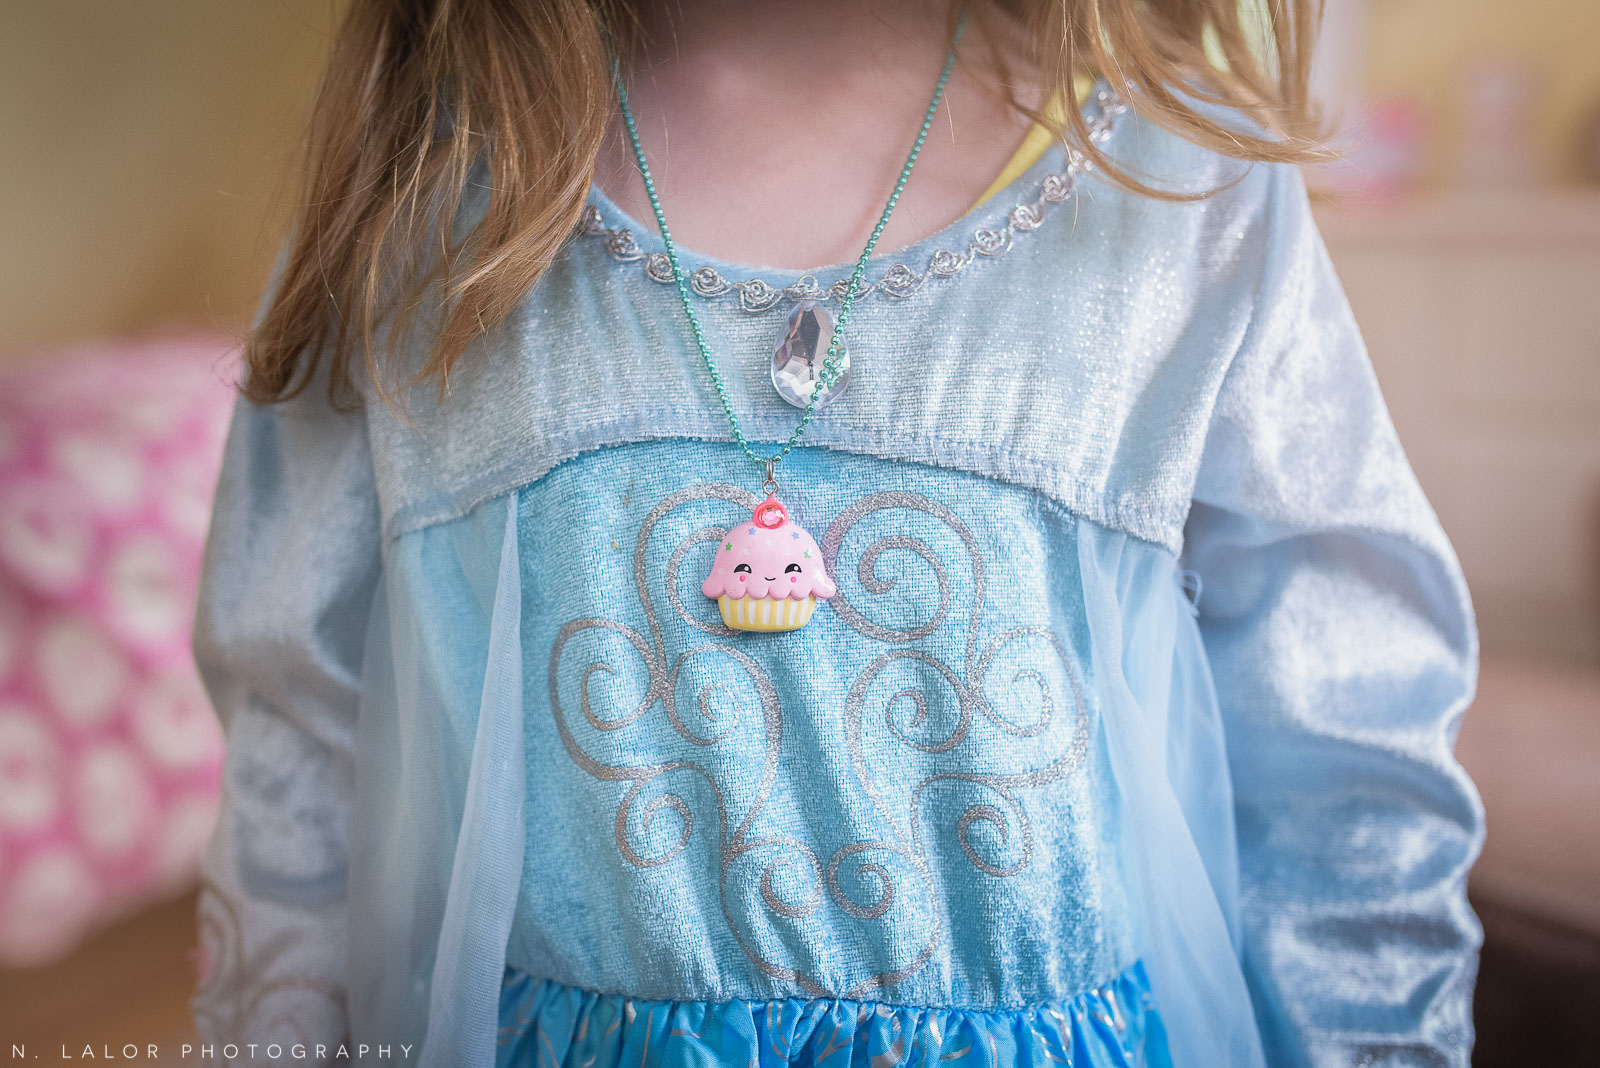 nlalor-photography-2015-daisy-being-elsa-stamford-ct-6.jpg